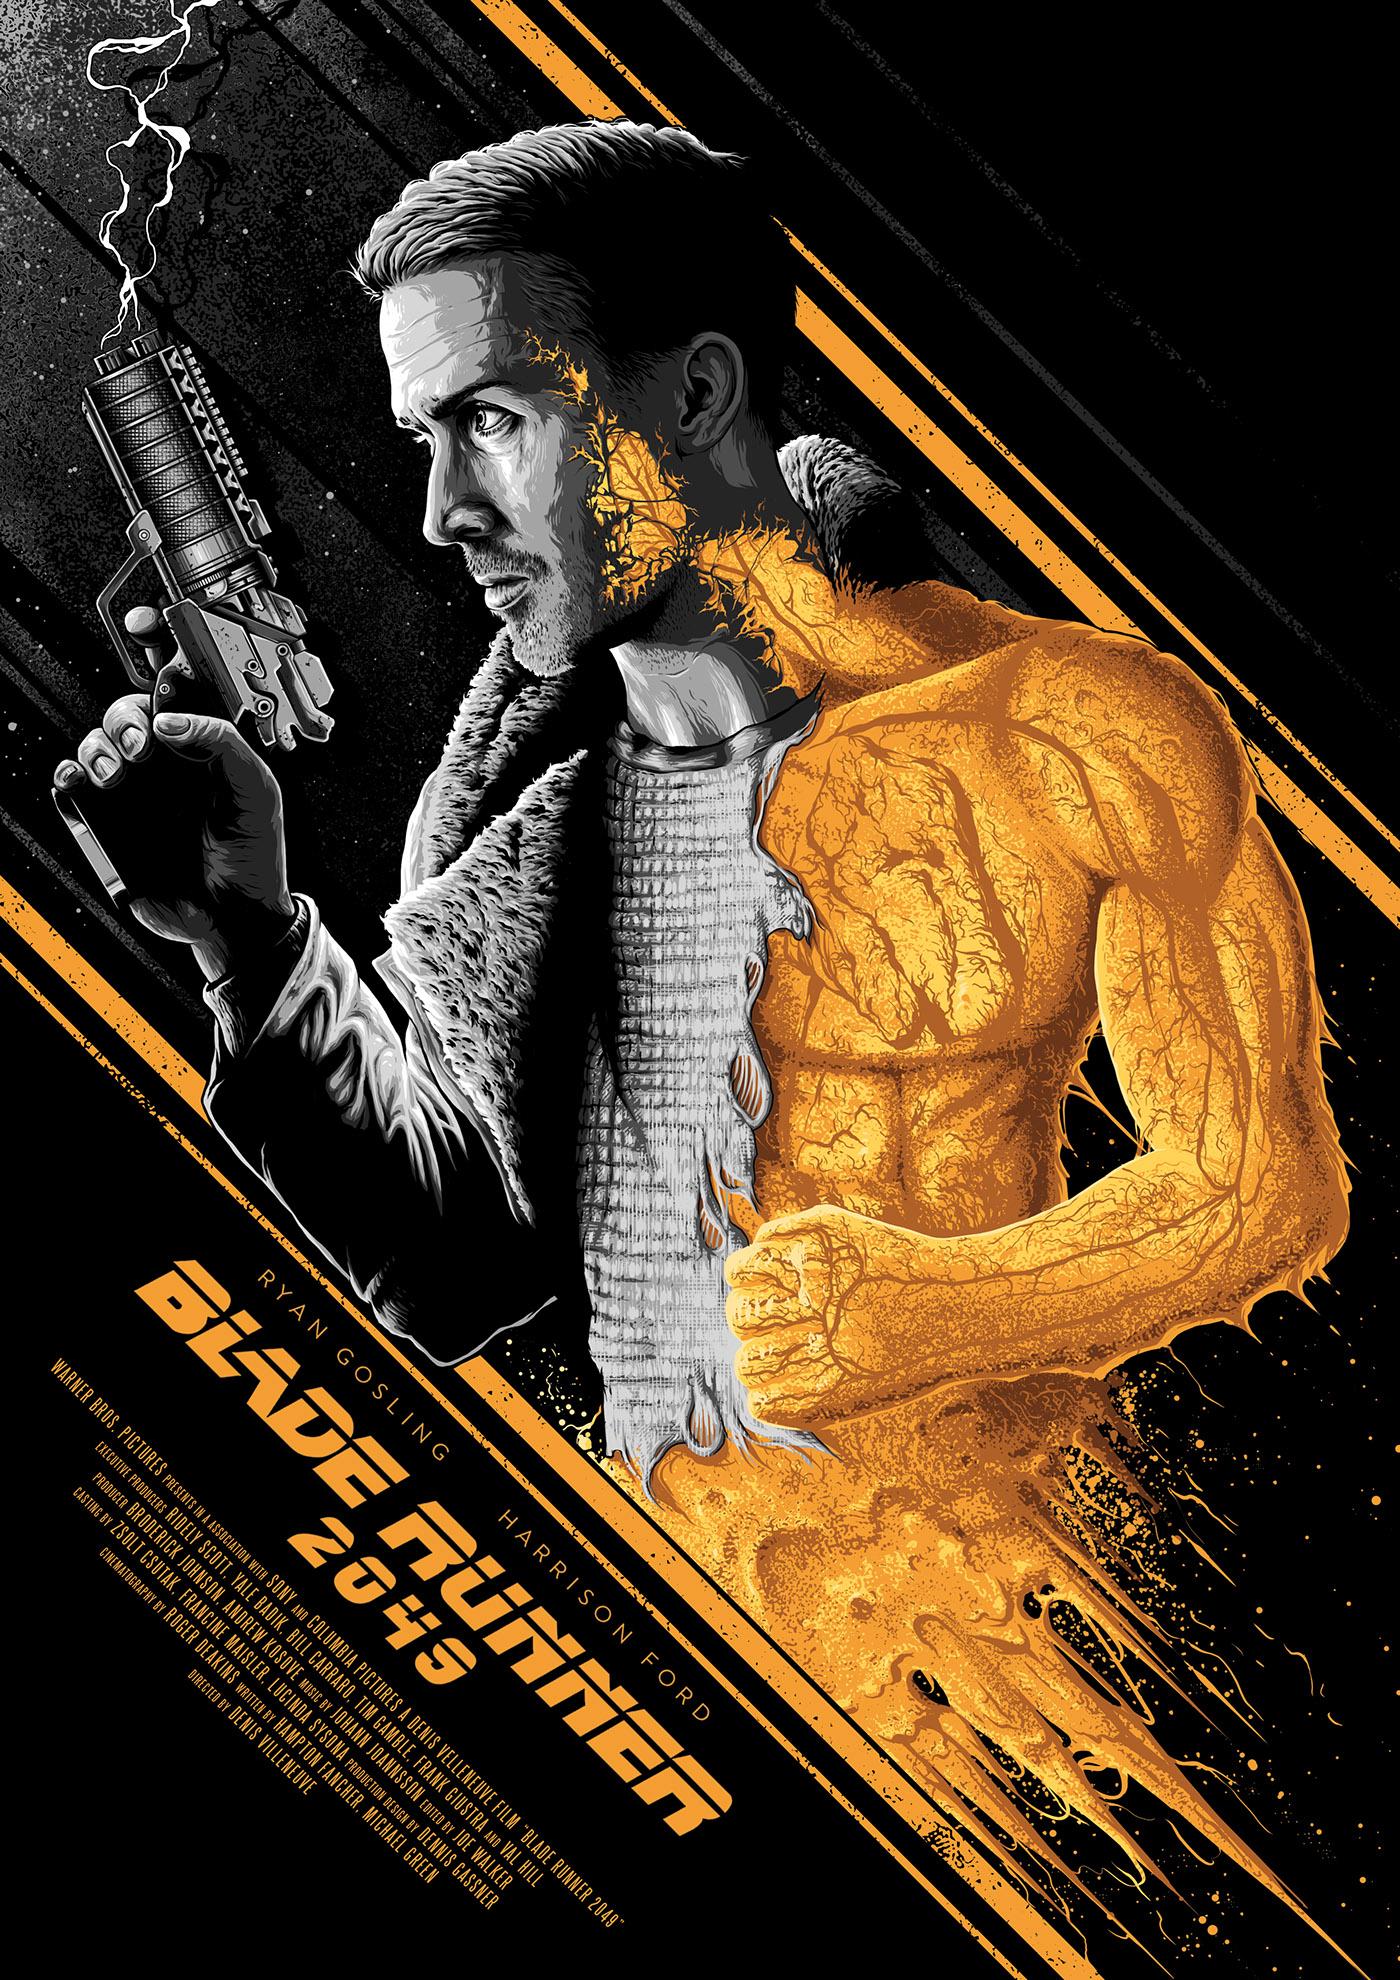 Blade Runner 2049 Teaser Trailer Premieres Showing Ryan